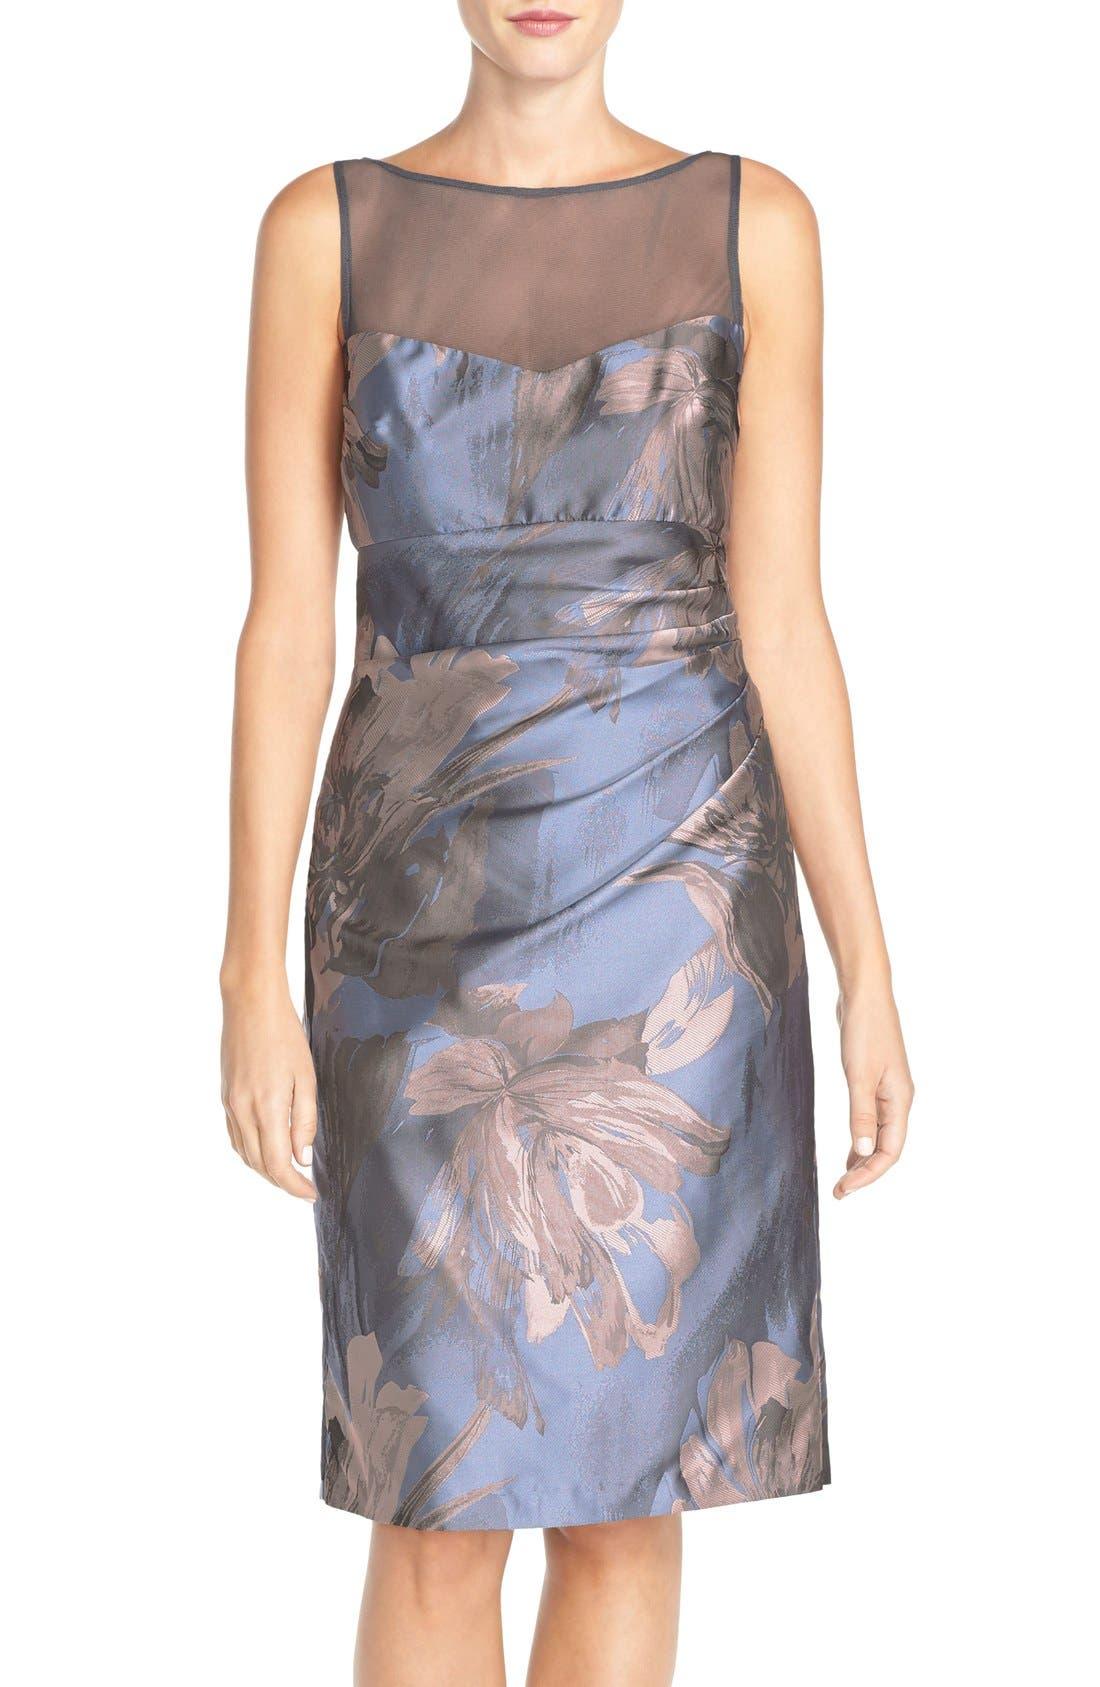 Alternate Image 1 Selected - Maggy London 'Splash' Floral Jacquard Sheath Dress (Regular & Petite)